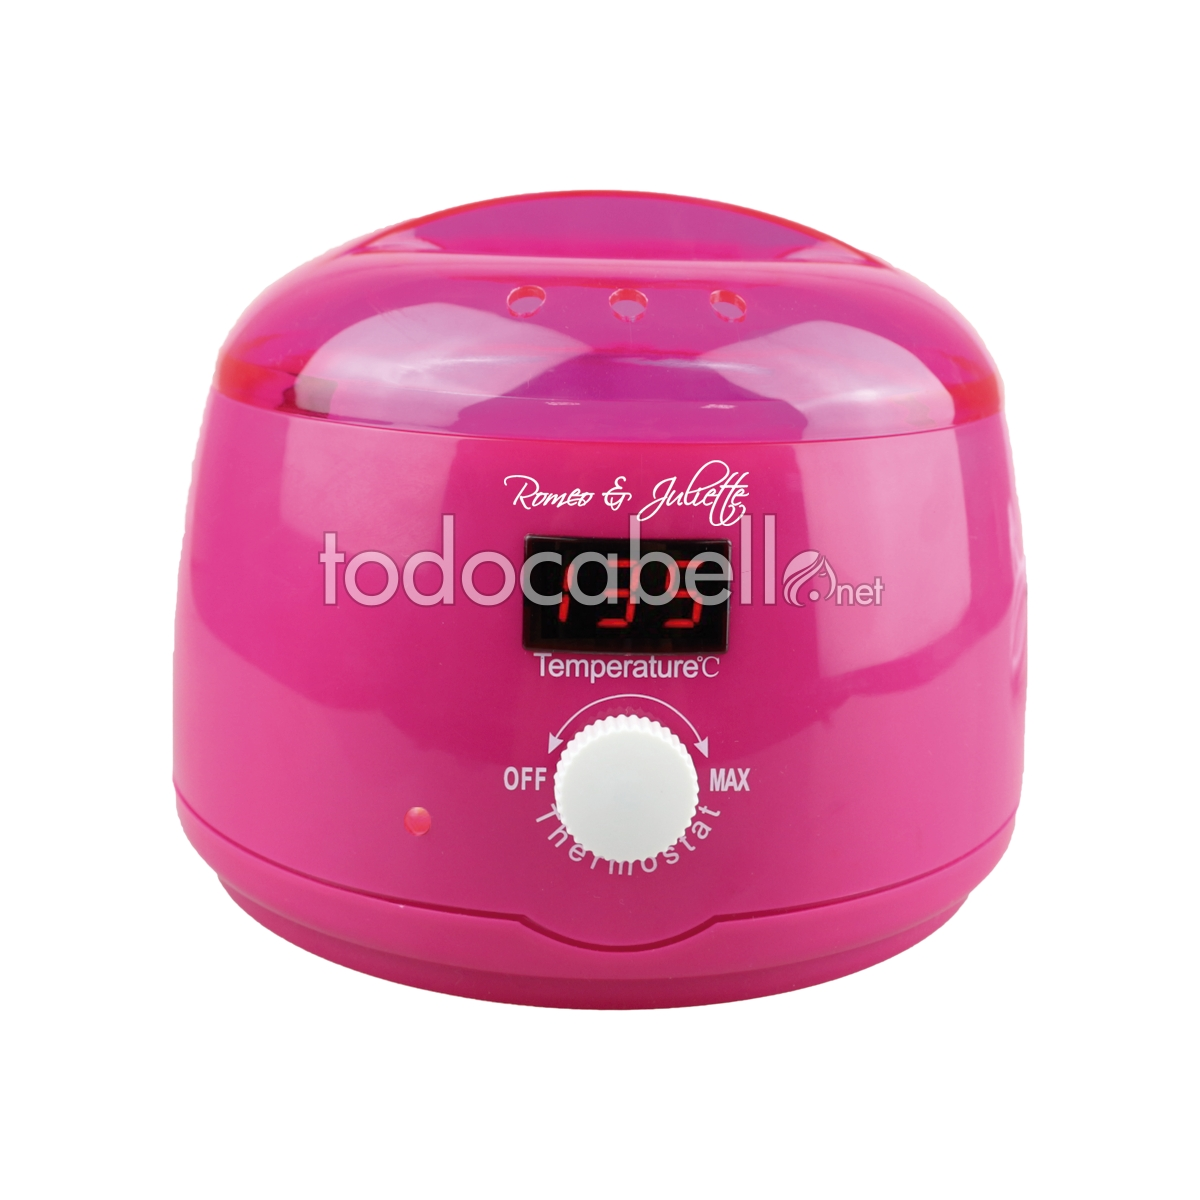 Albi Line - Todocabello.net 086cdf83c89b